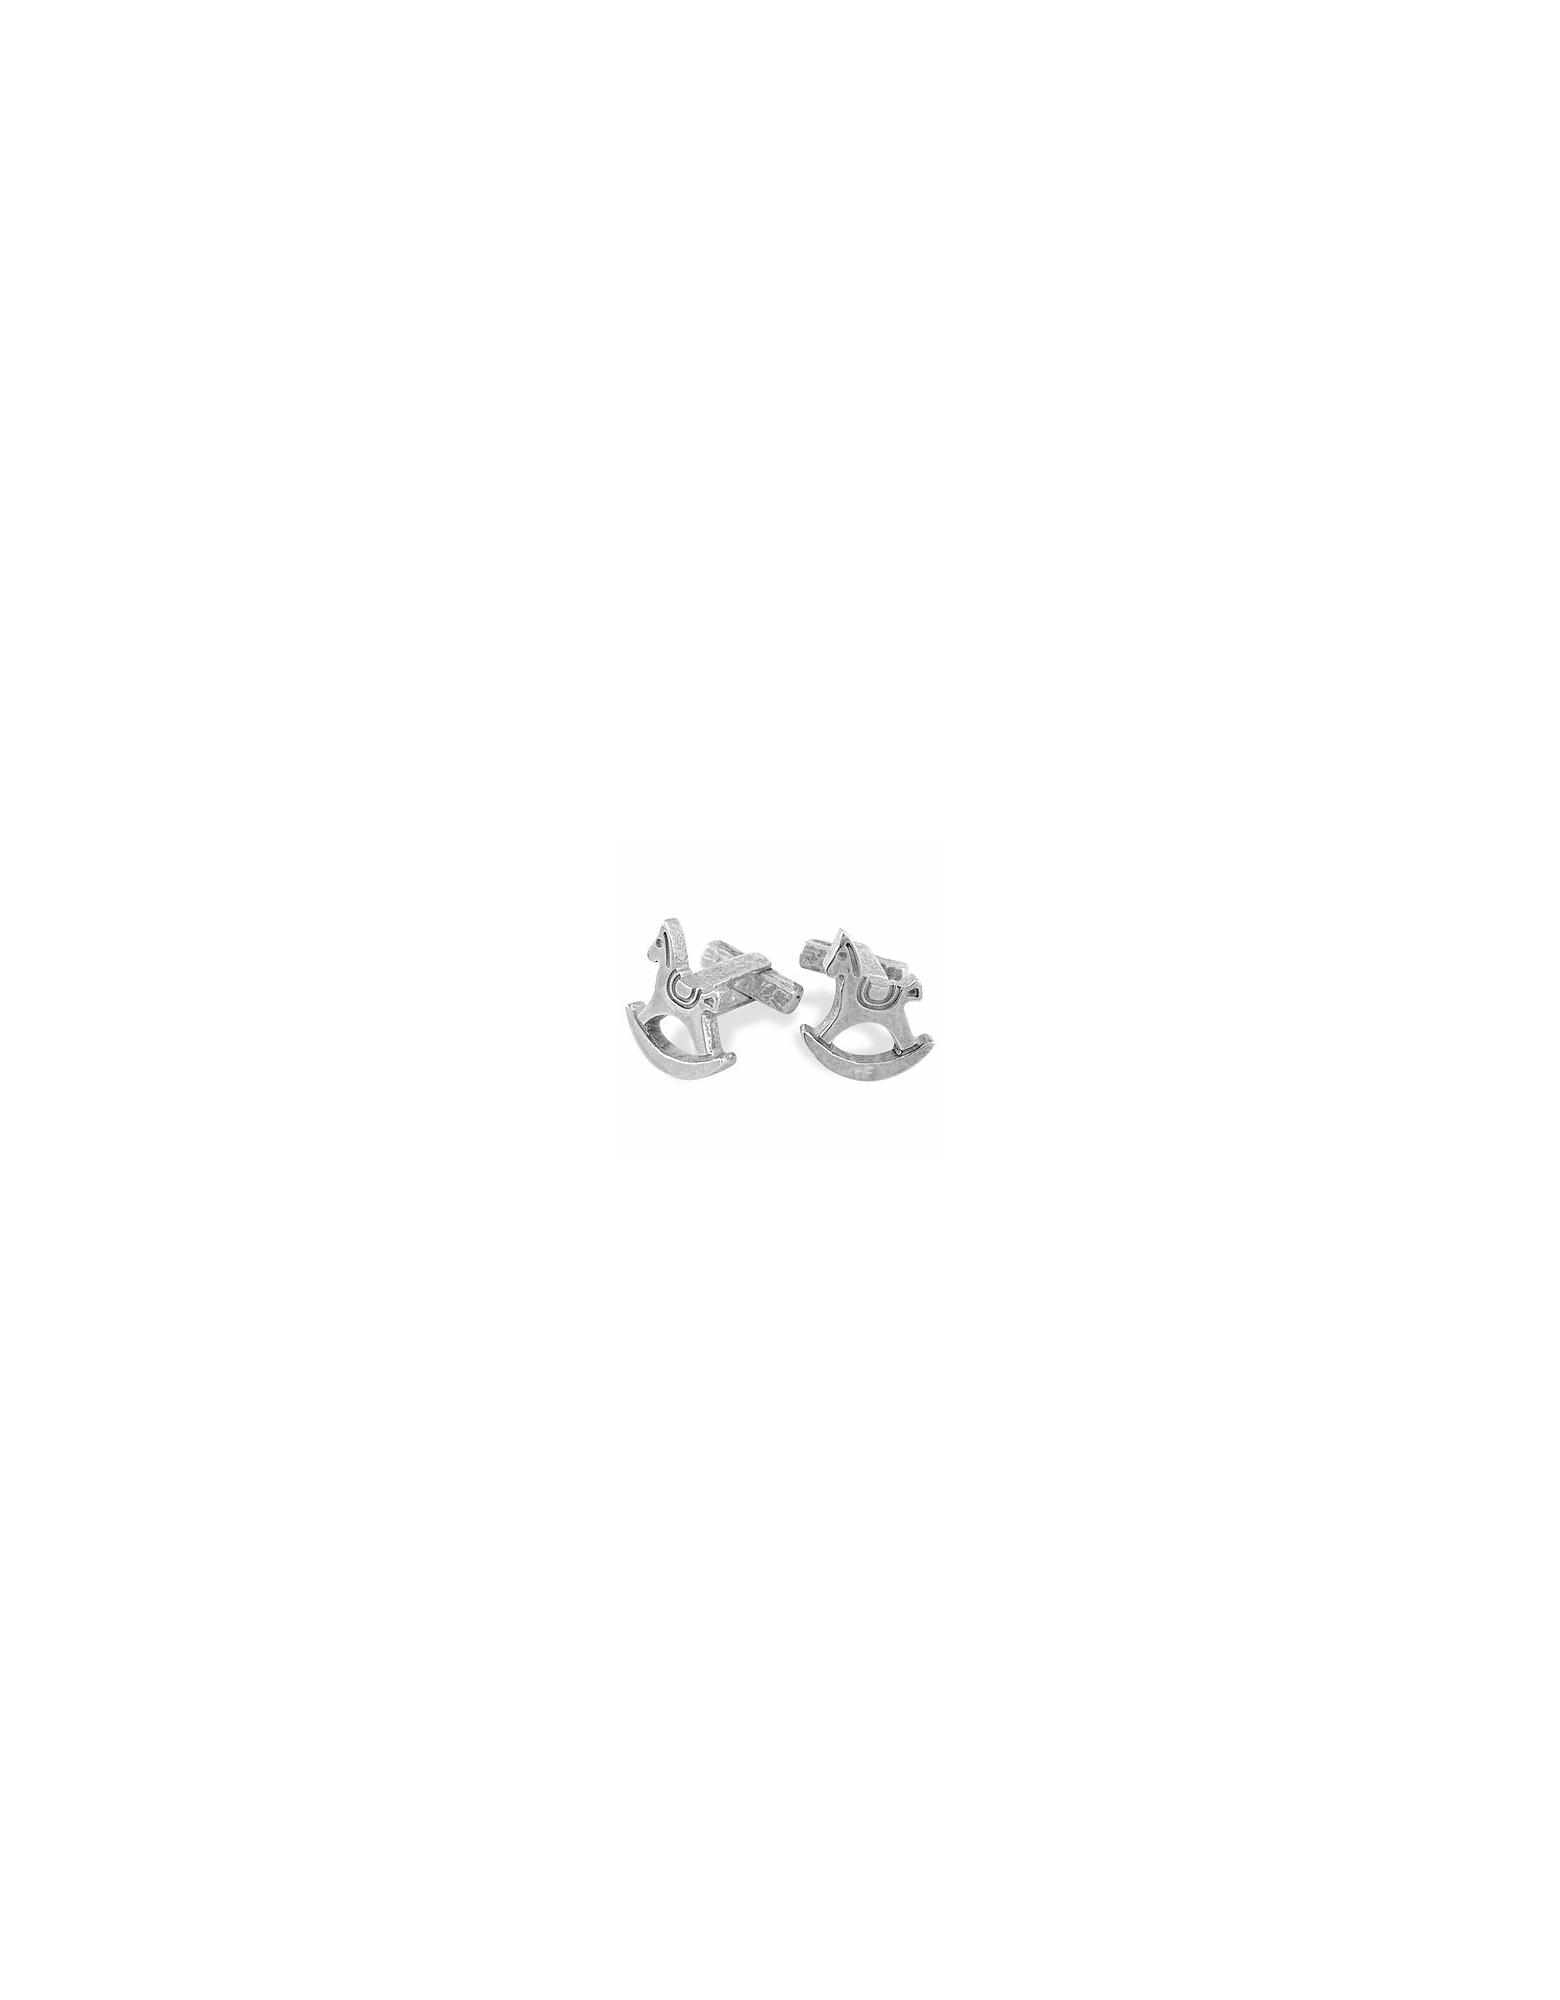 Torrini Cufflinks, Sterling Silver Rocking Horse Cufflinks